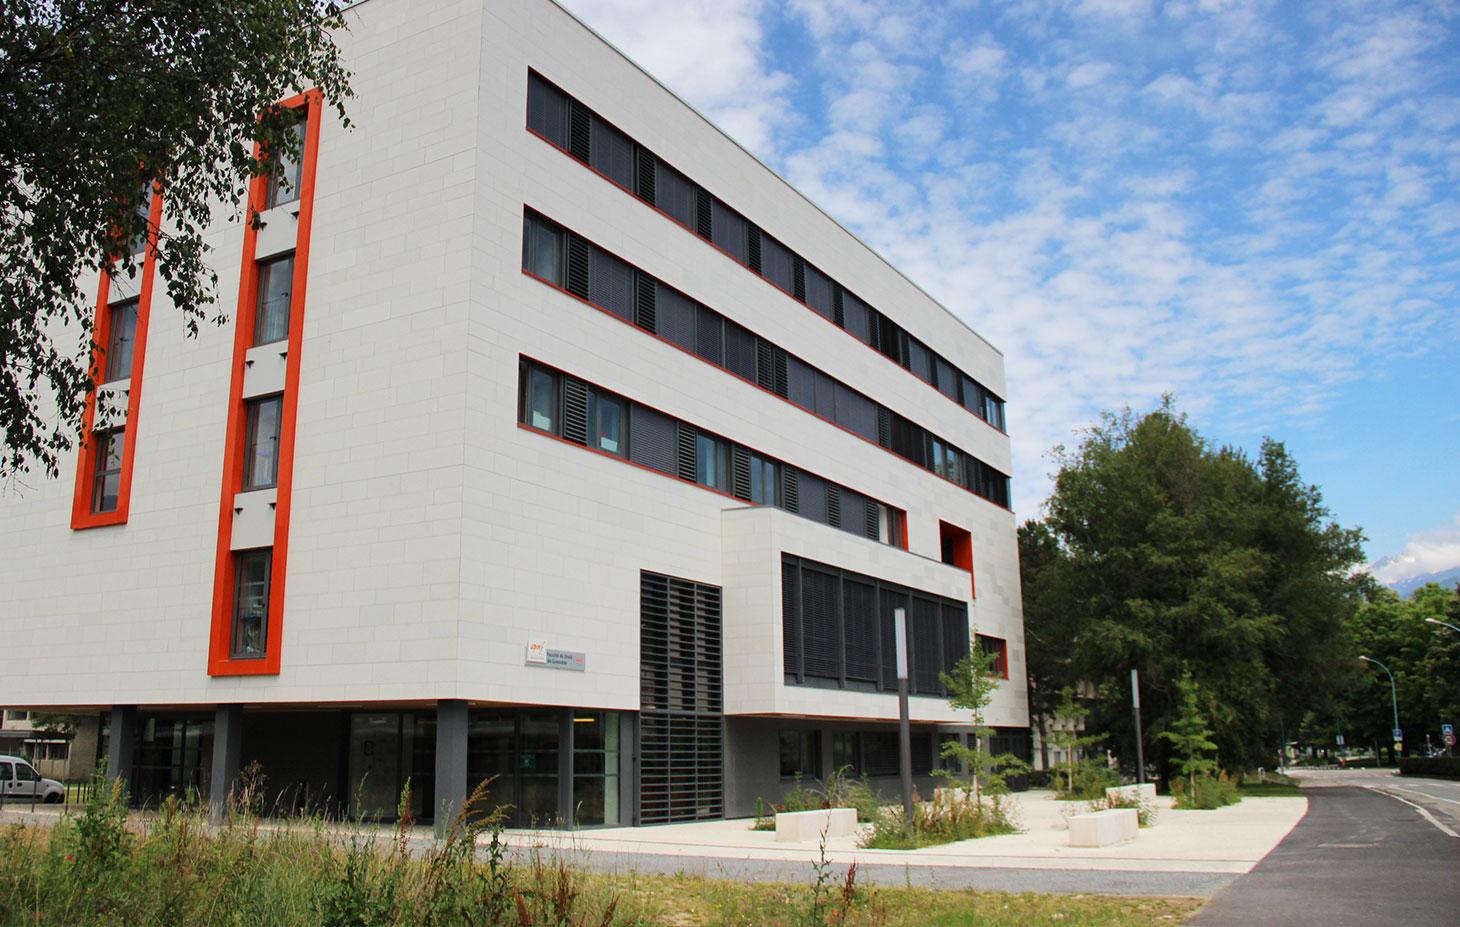 Université grenoble alpes grenoble faculty of law